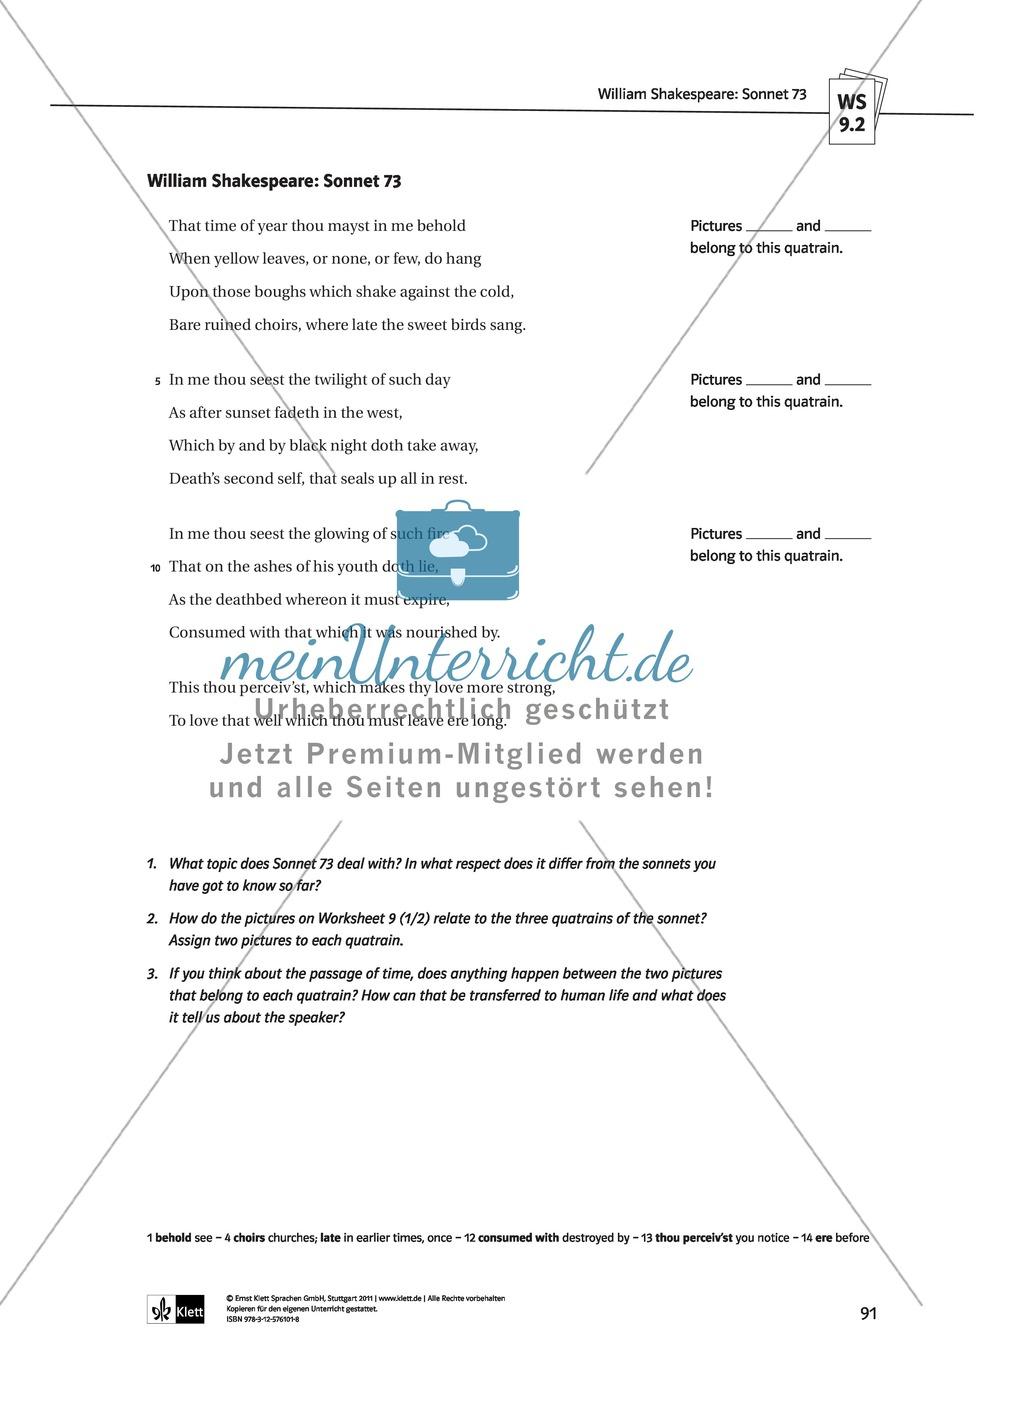 Wunderbar Horizontale Wurfbewegung Arbeitsblatt Fotos - Mathe ...